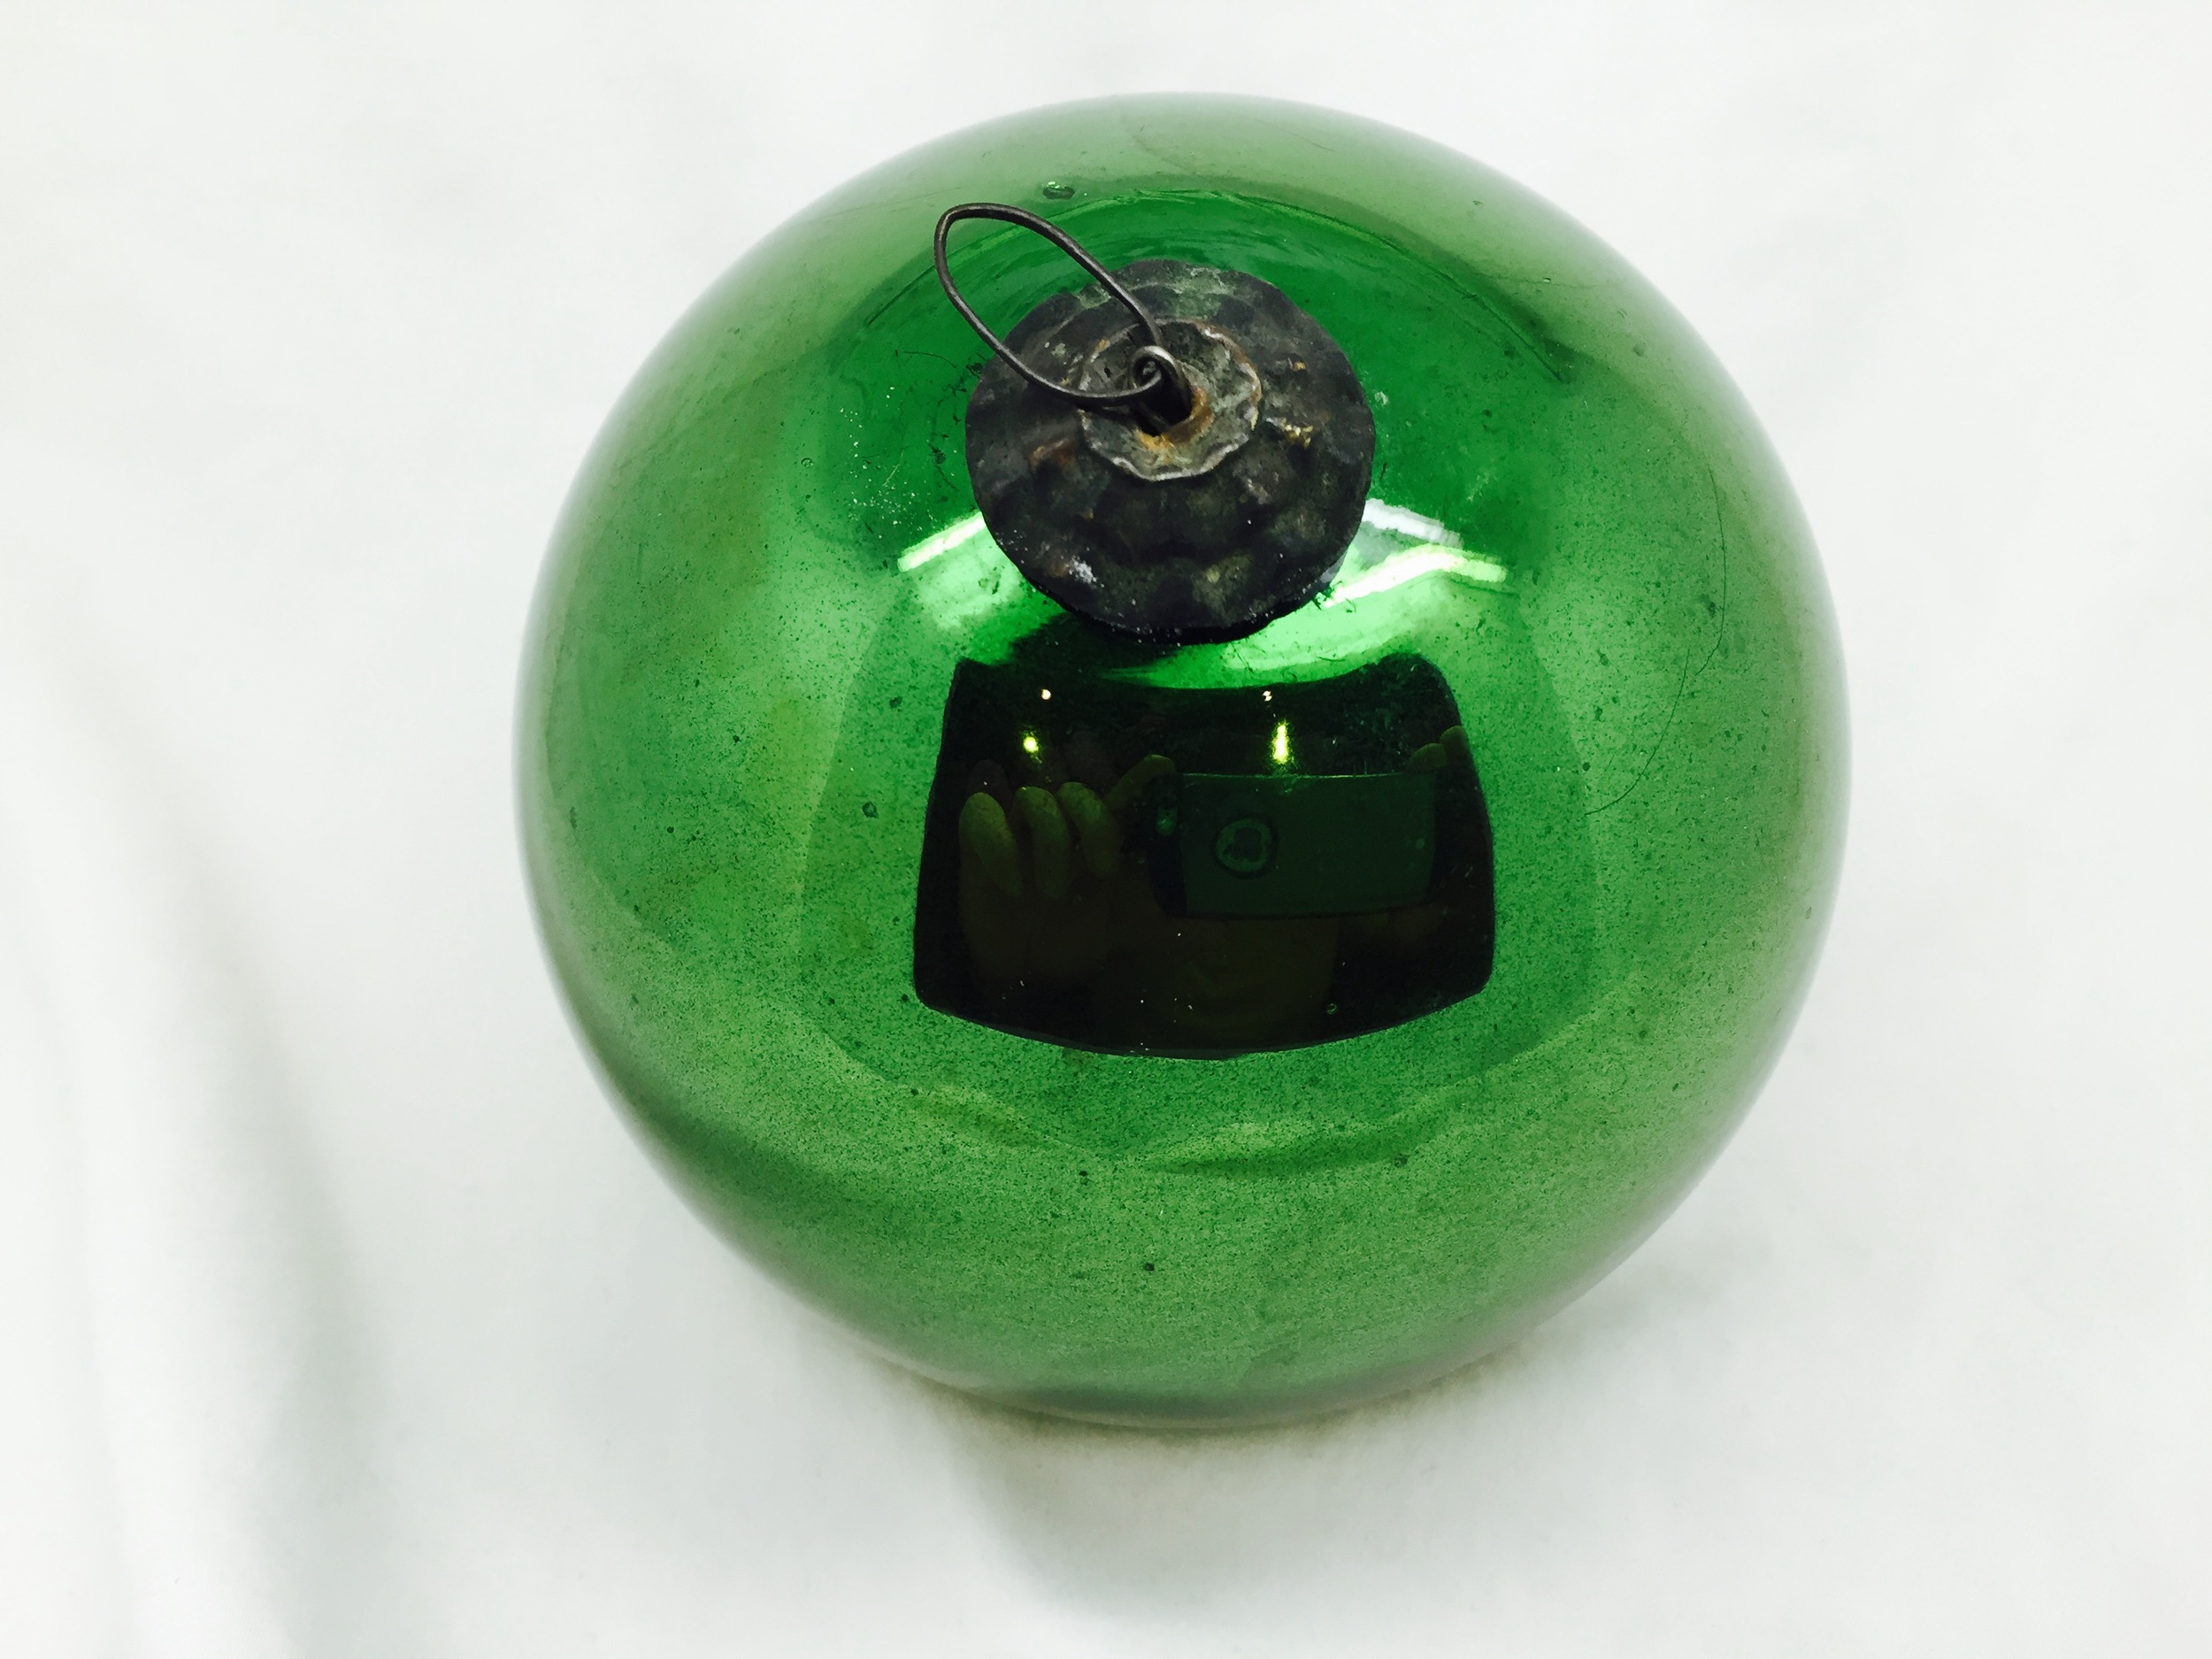 antique-kugel-christmas-ornament-ny106a